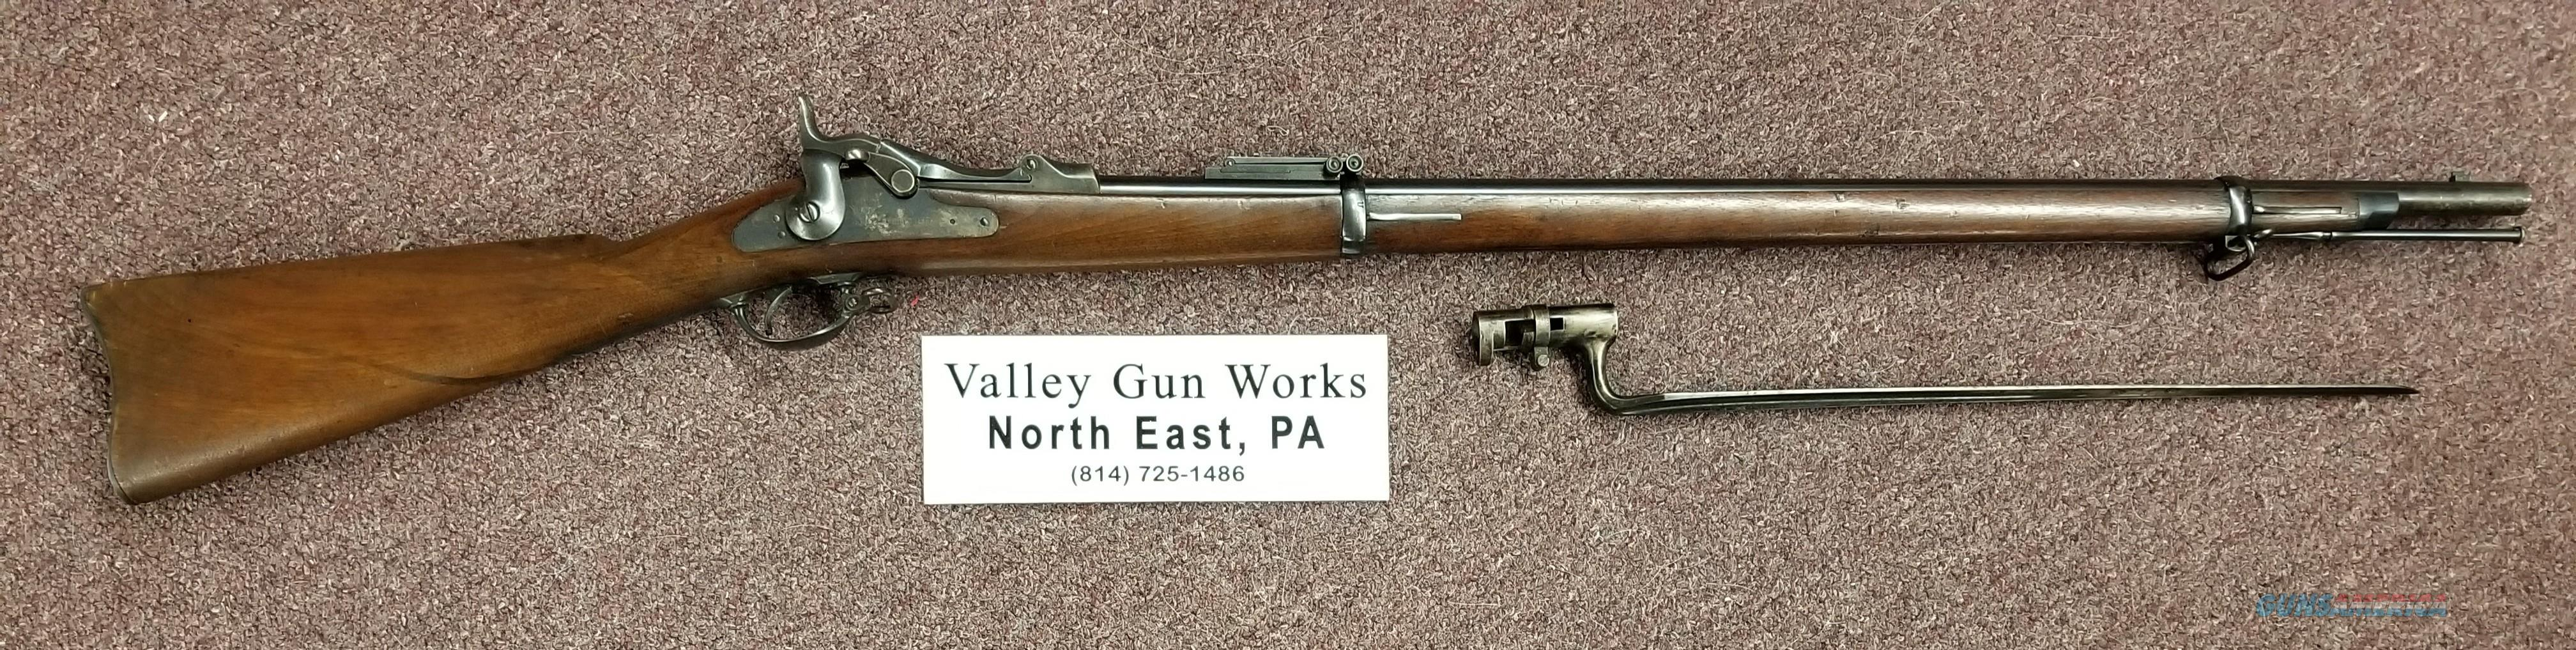 Springfield 1873 Trapdoor 45-70 w/bayonet - Free Shipping  Guns > Rifles > Military Misc. Rifles US > Rev War - 1860